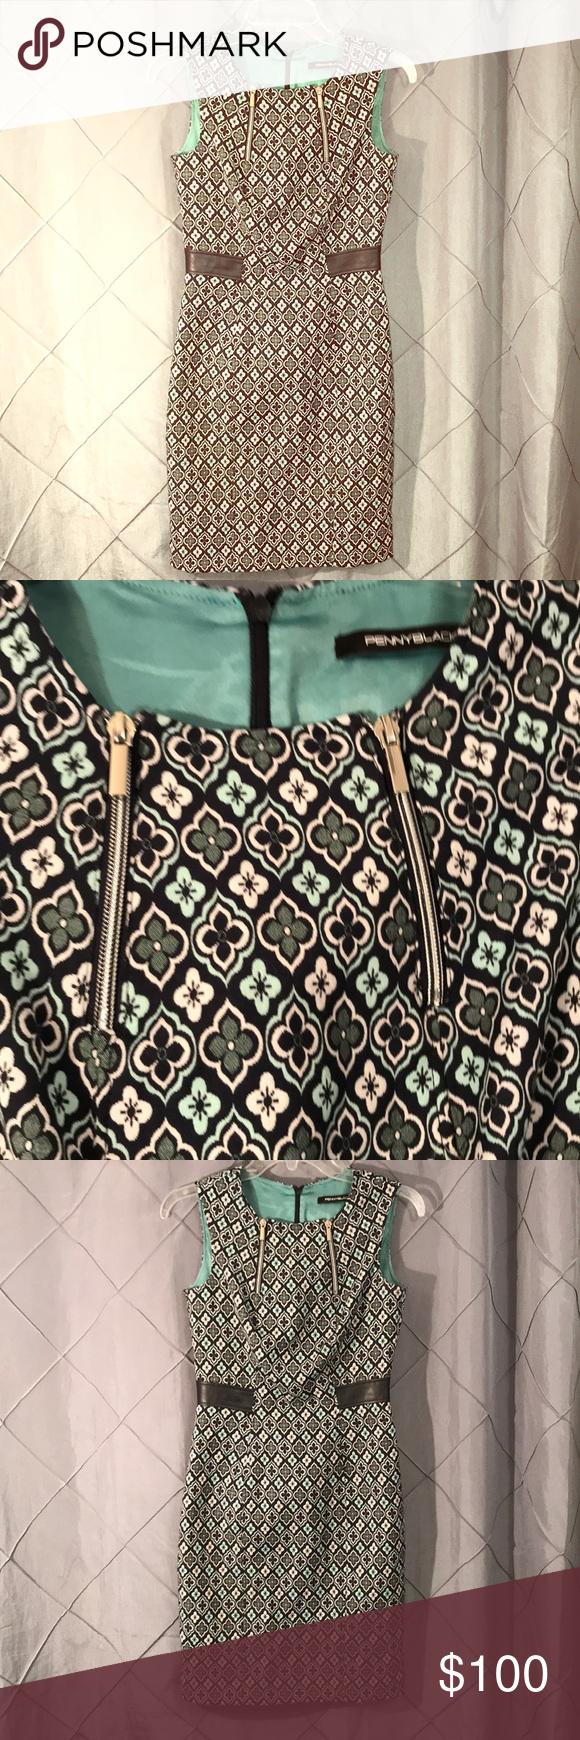 Penny Black Strait Pencil Dress Zipper Sleath S Dress Zipper Pencil Dress Penny Black [ 1740 x 580 Pixel ]